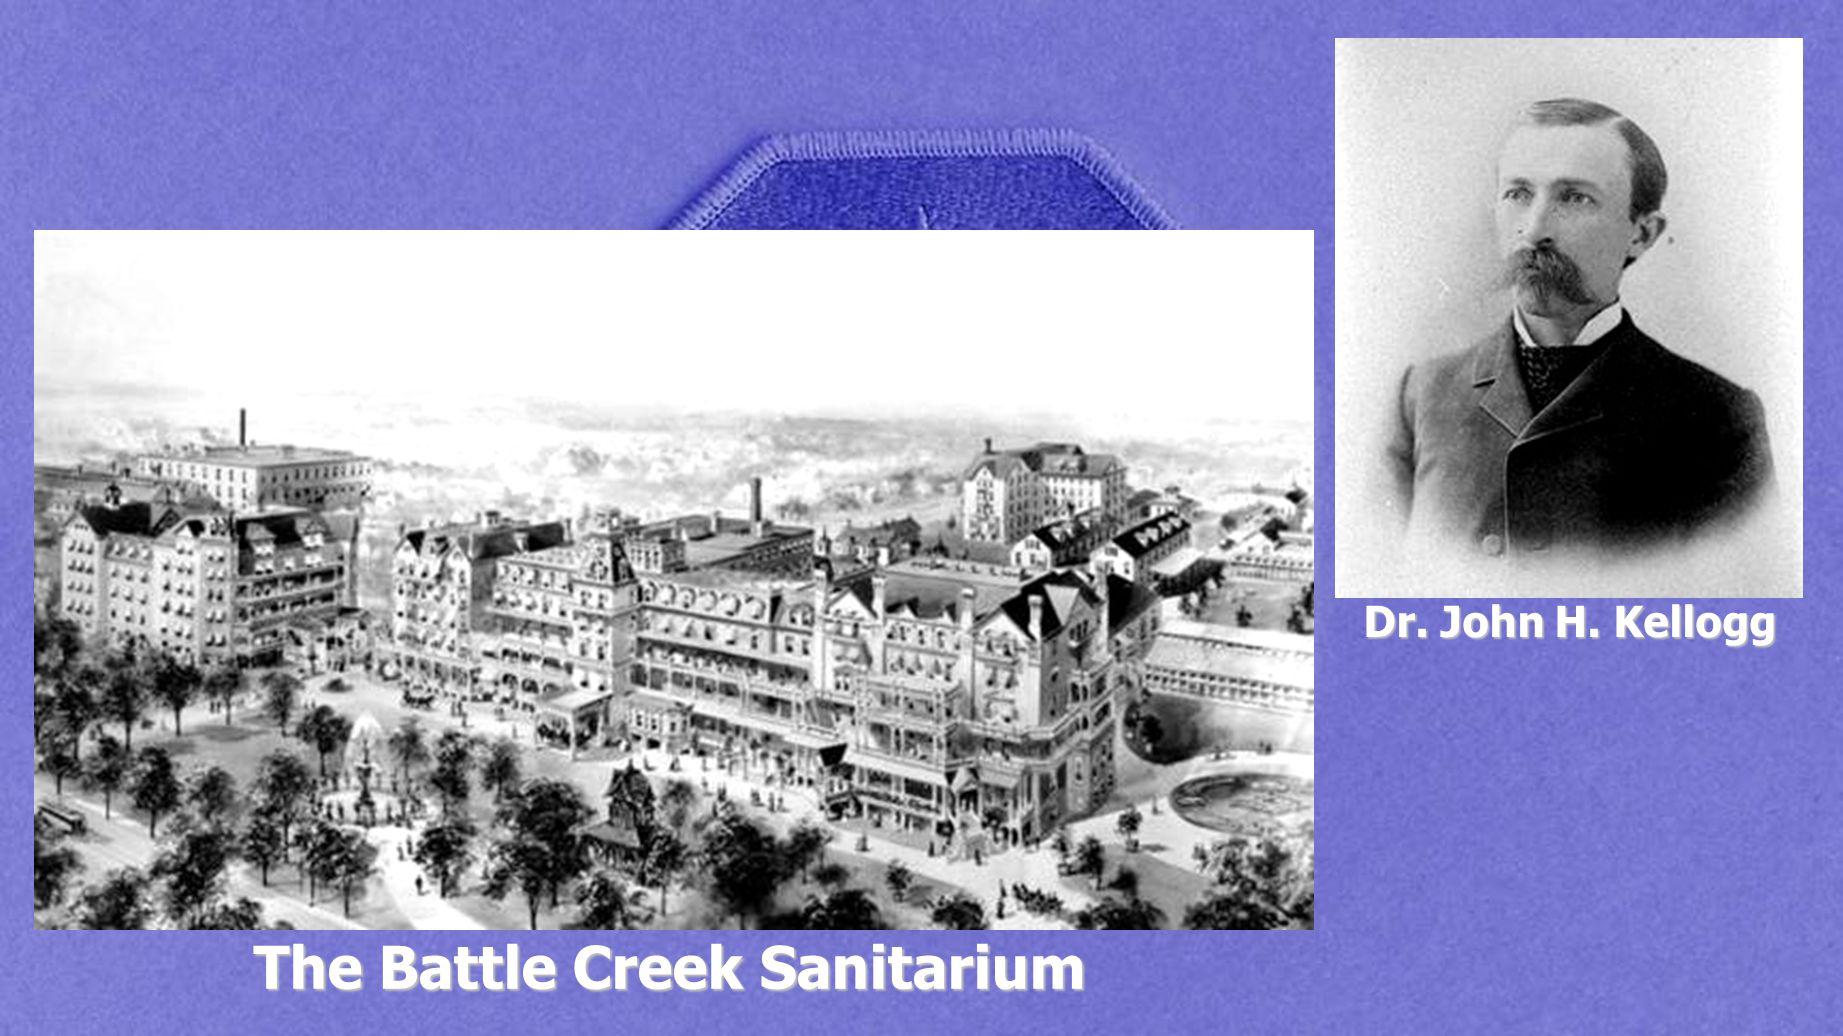 The Battle Creek Sanitarium Dr. John H. Kellogg